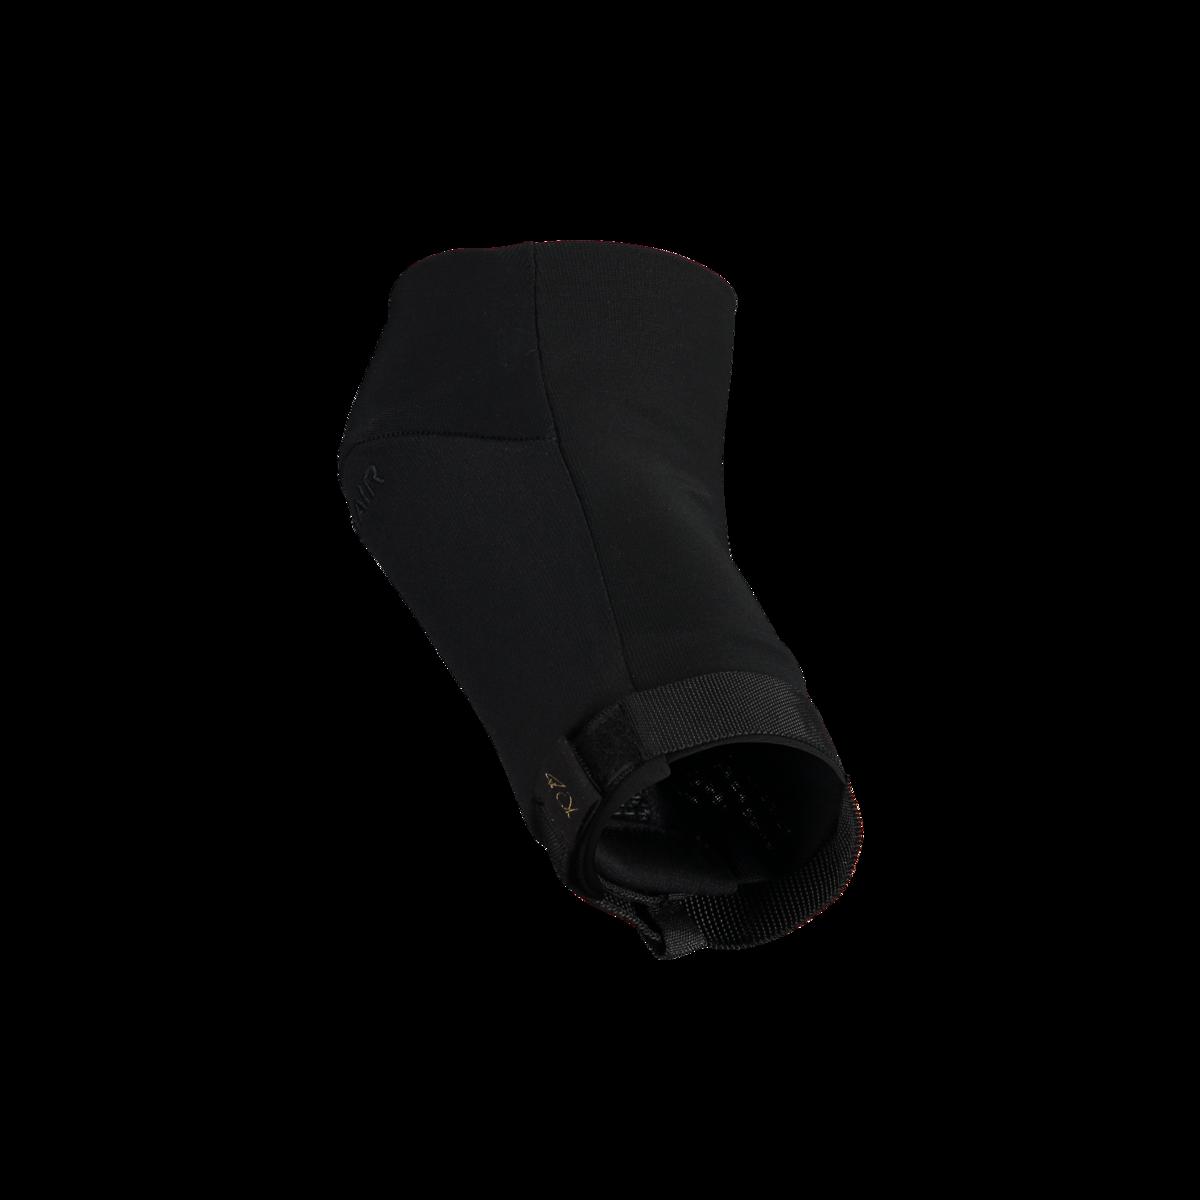 POC POC Joint VPD Air Elbow Protector Fabio Ed.